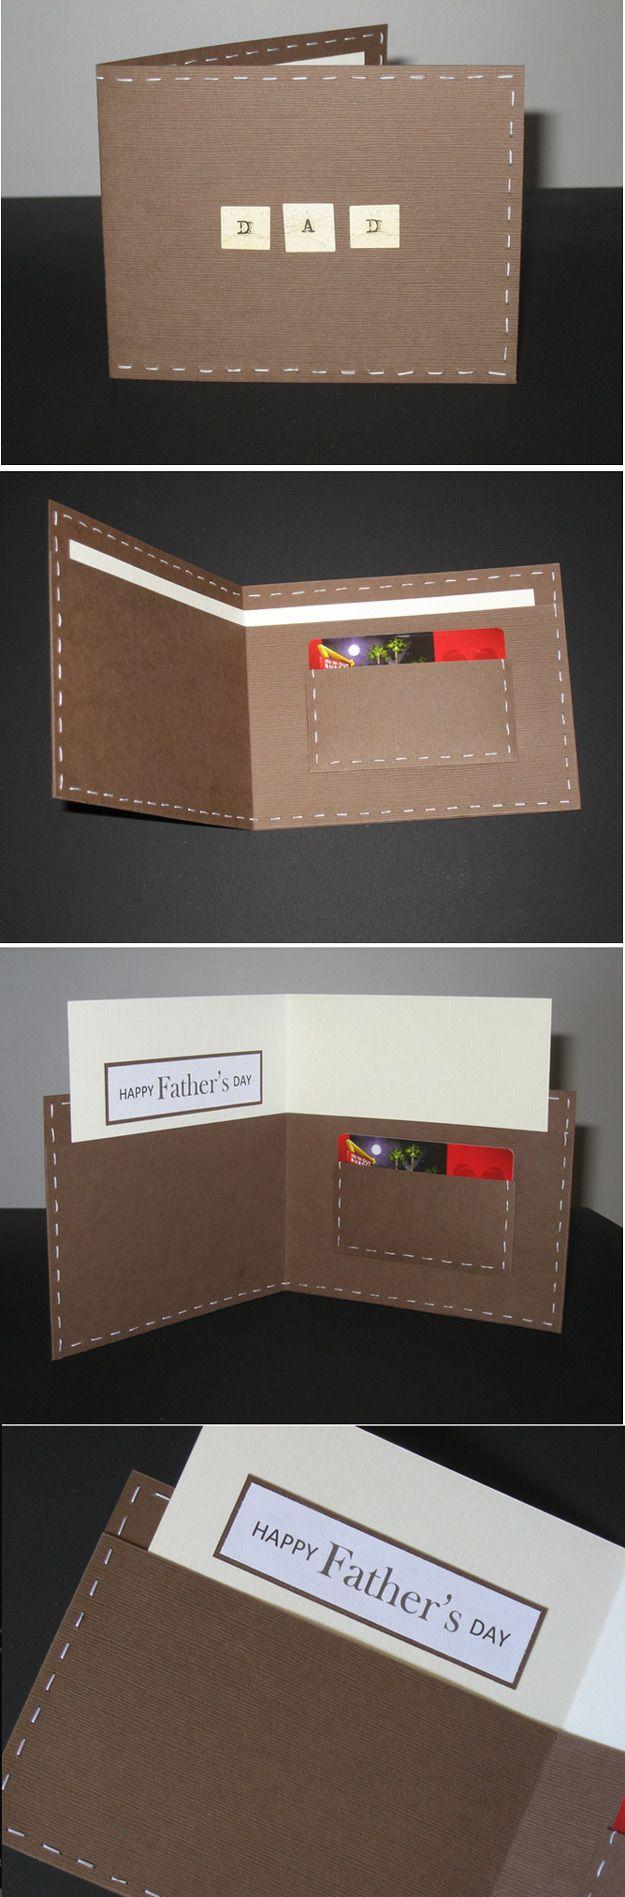 Cool DIY Fathers Day Card Ideas | DIY Wallet Card by DIY Ready at diyready.com/....